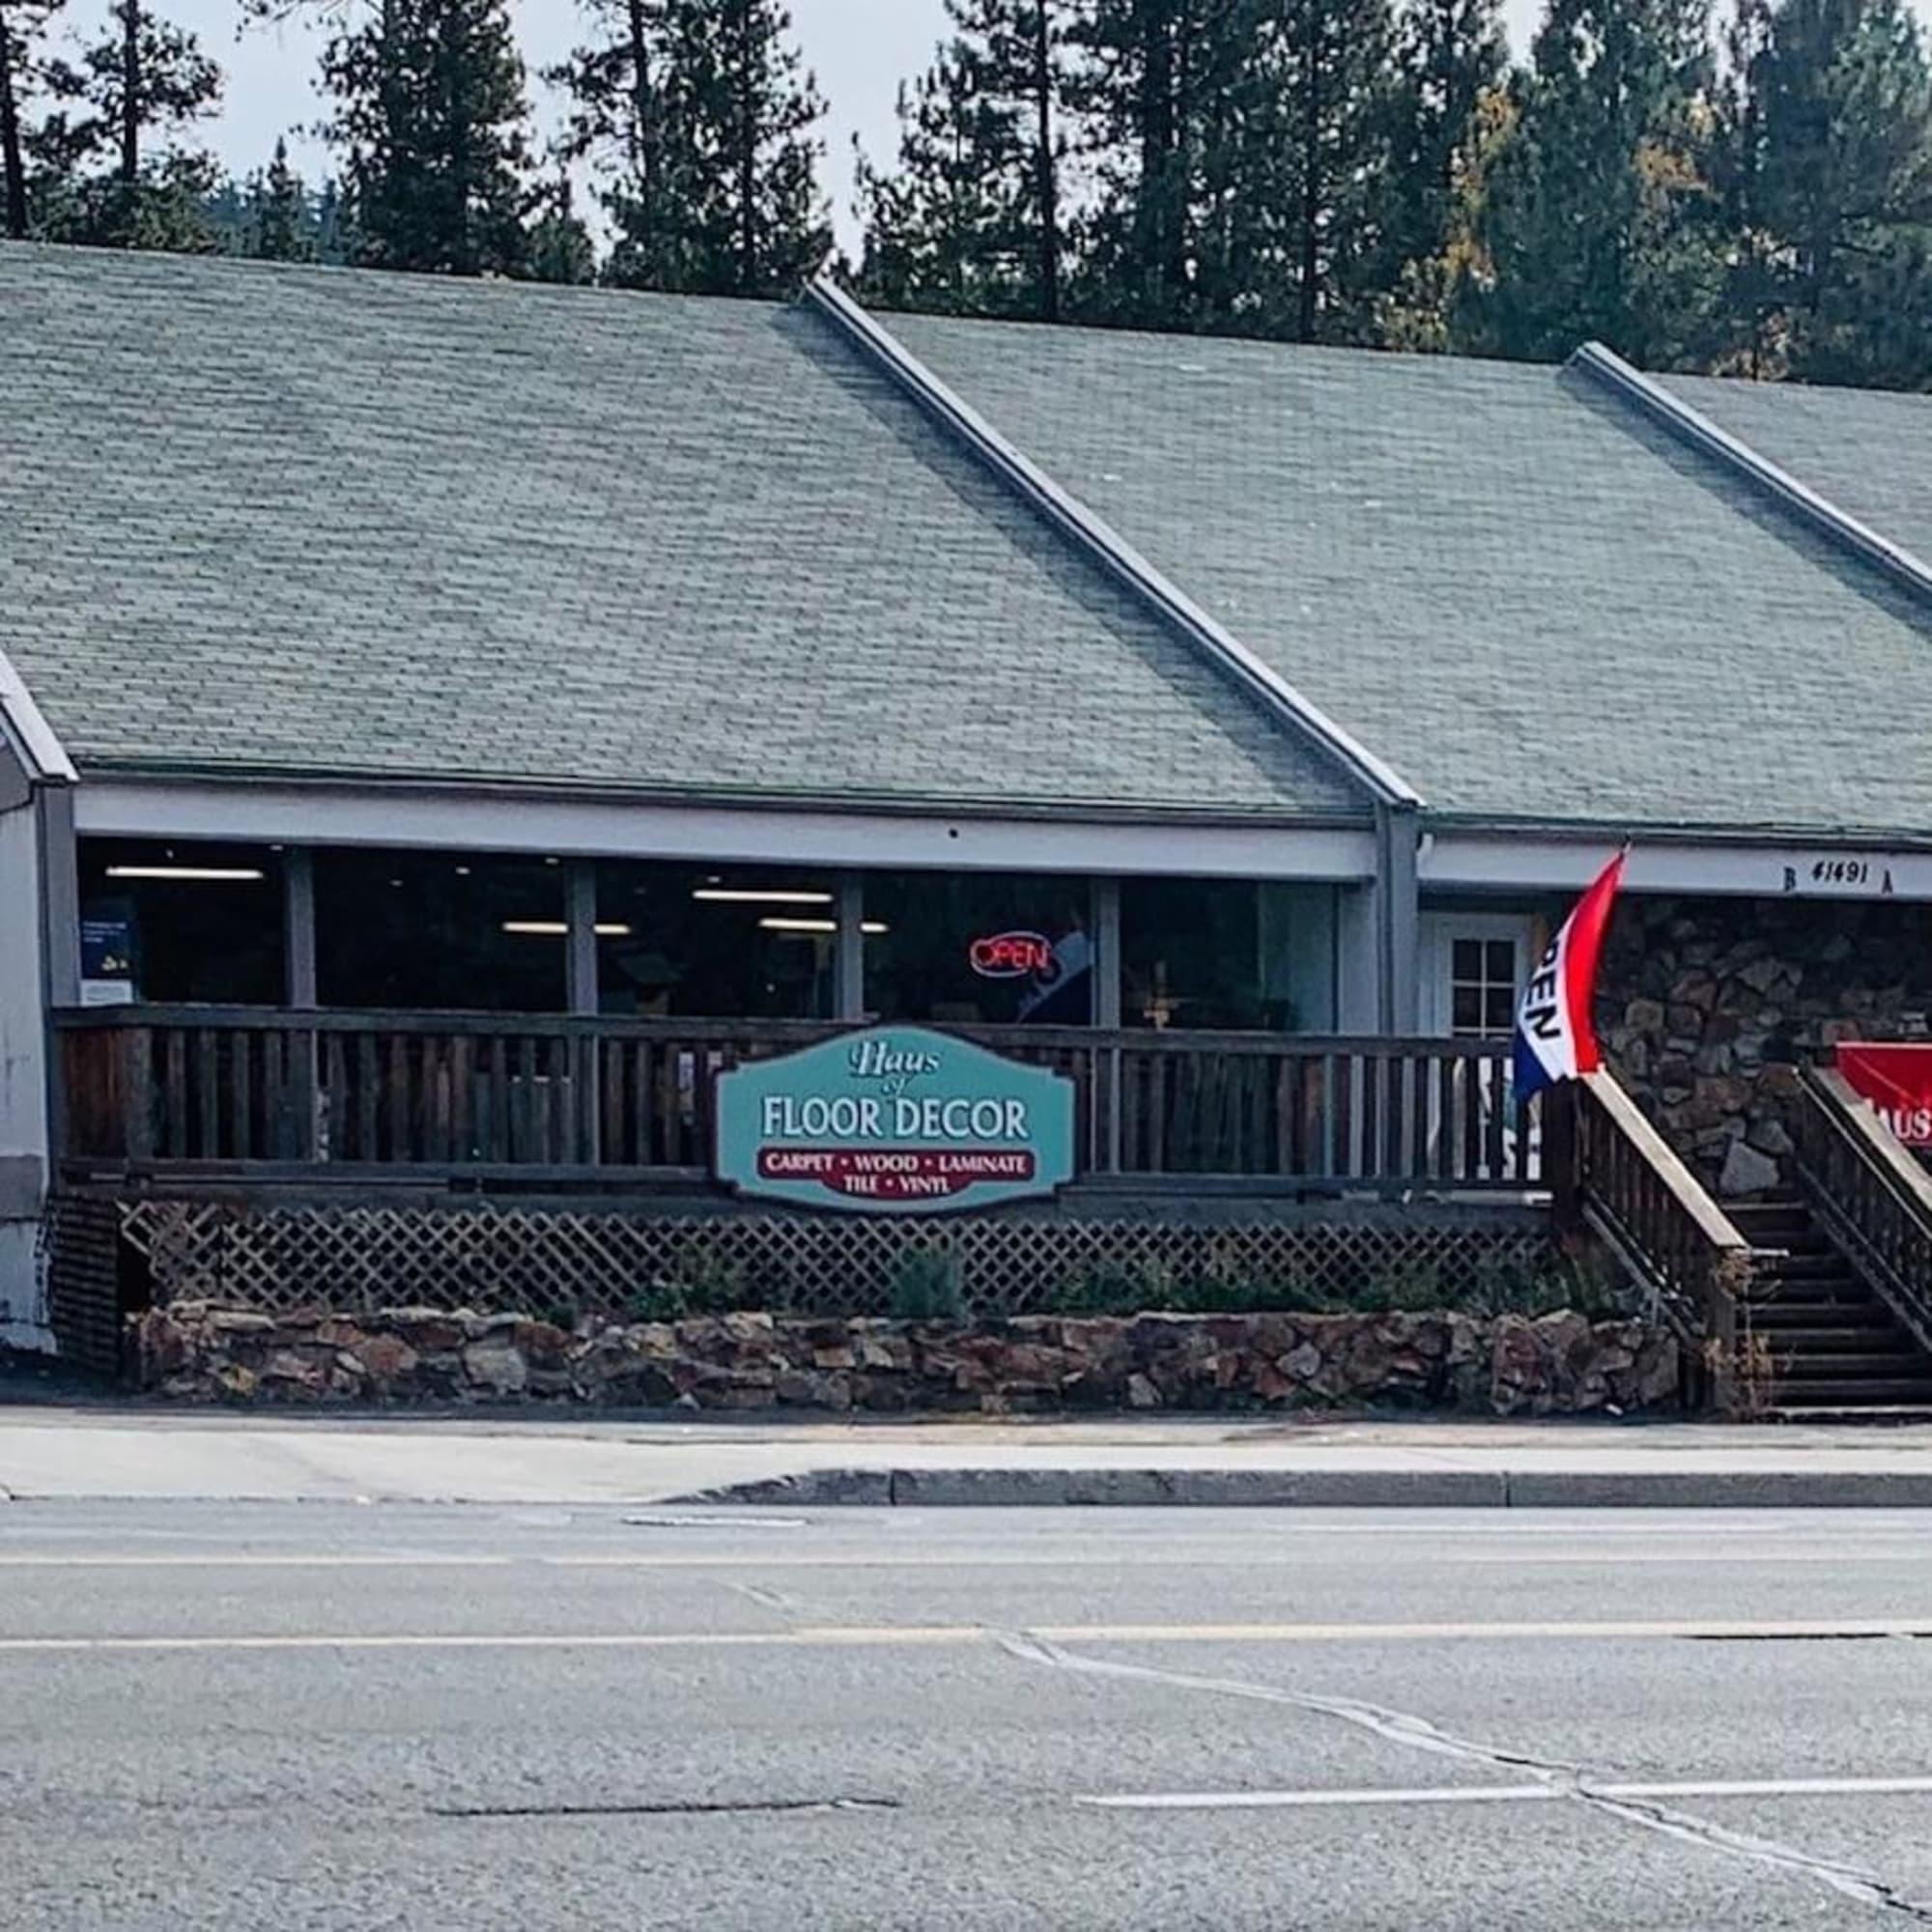 Haus Of Floor Decor - 41491 Big Bear Blvd Big Bear Lake, CA 92315